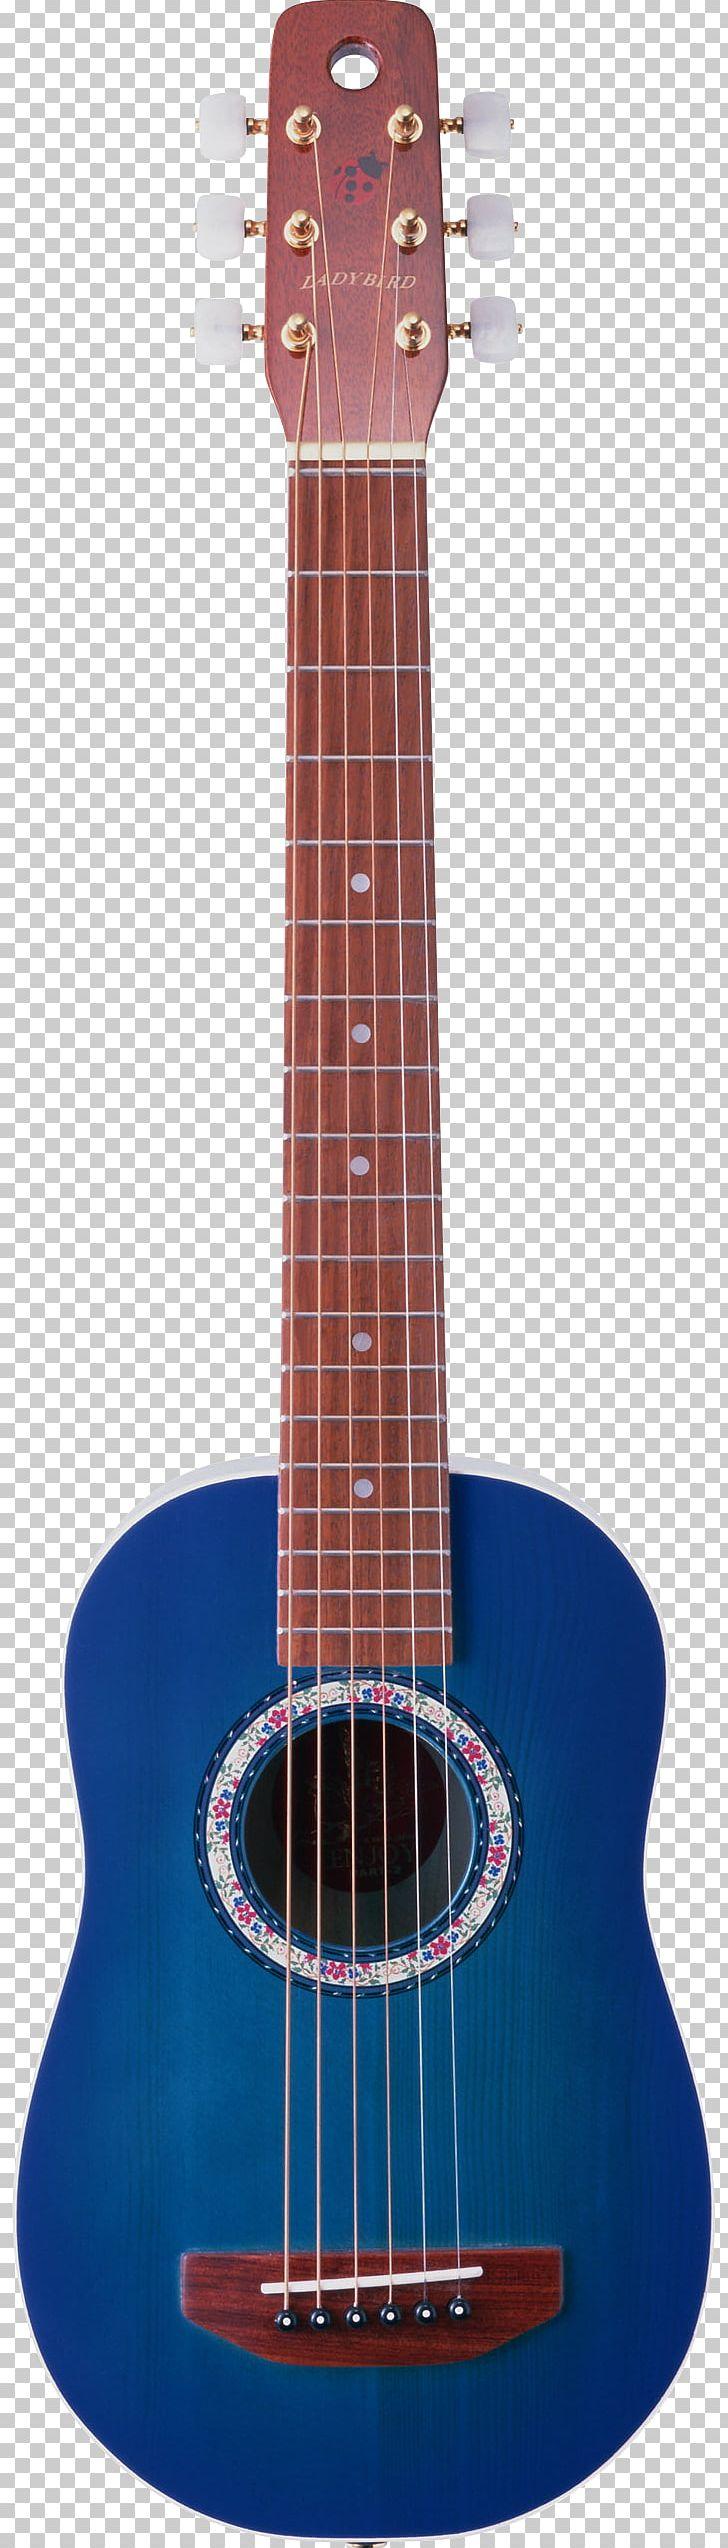 Guitar Musical Instrument PNG, Clipart, Cello, Classical Guitar, Cuatro, Guitar Accessory, Guitarist Free PNG Download